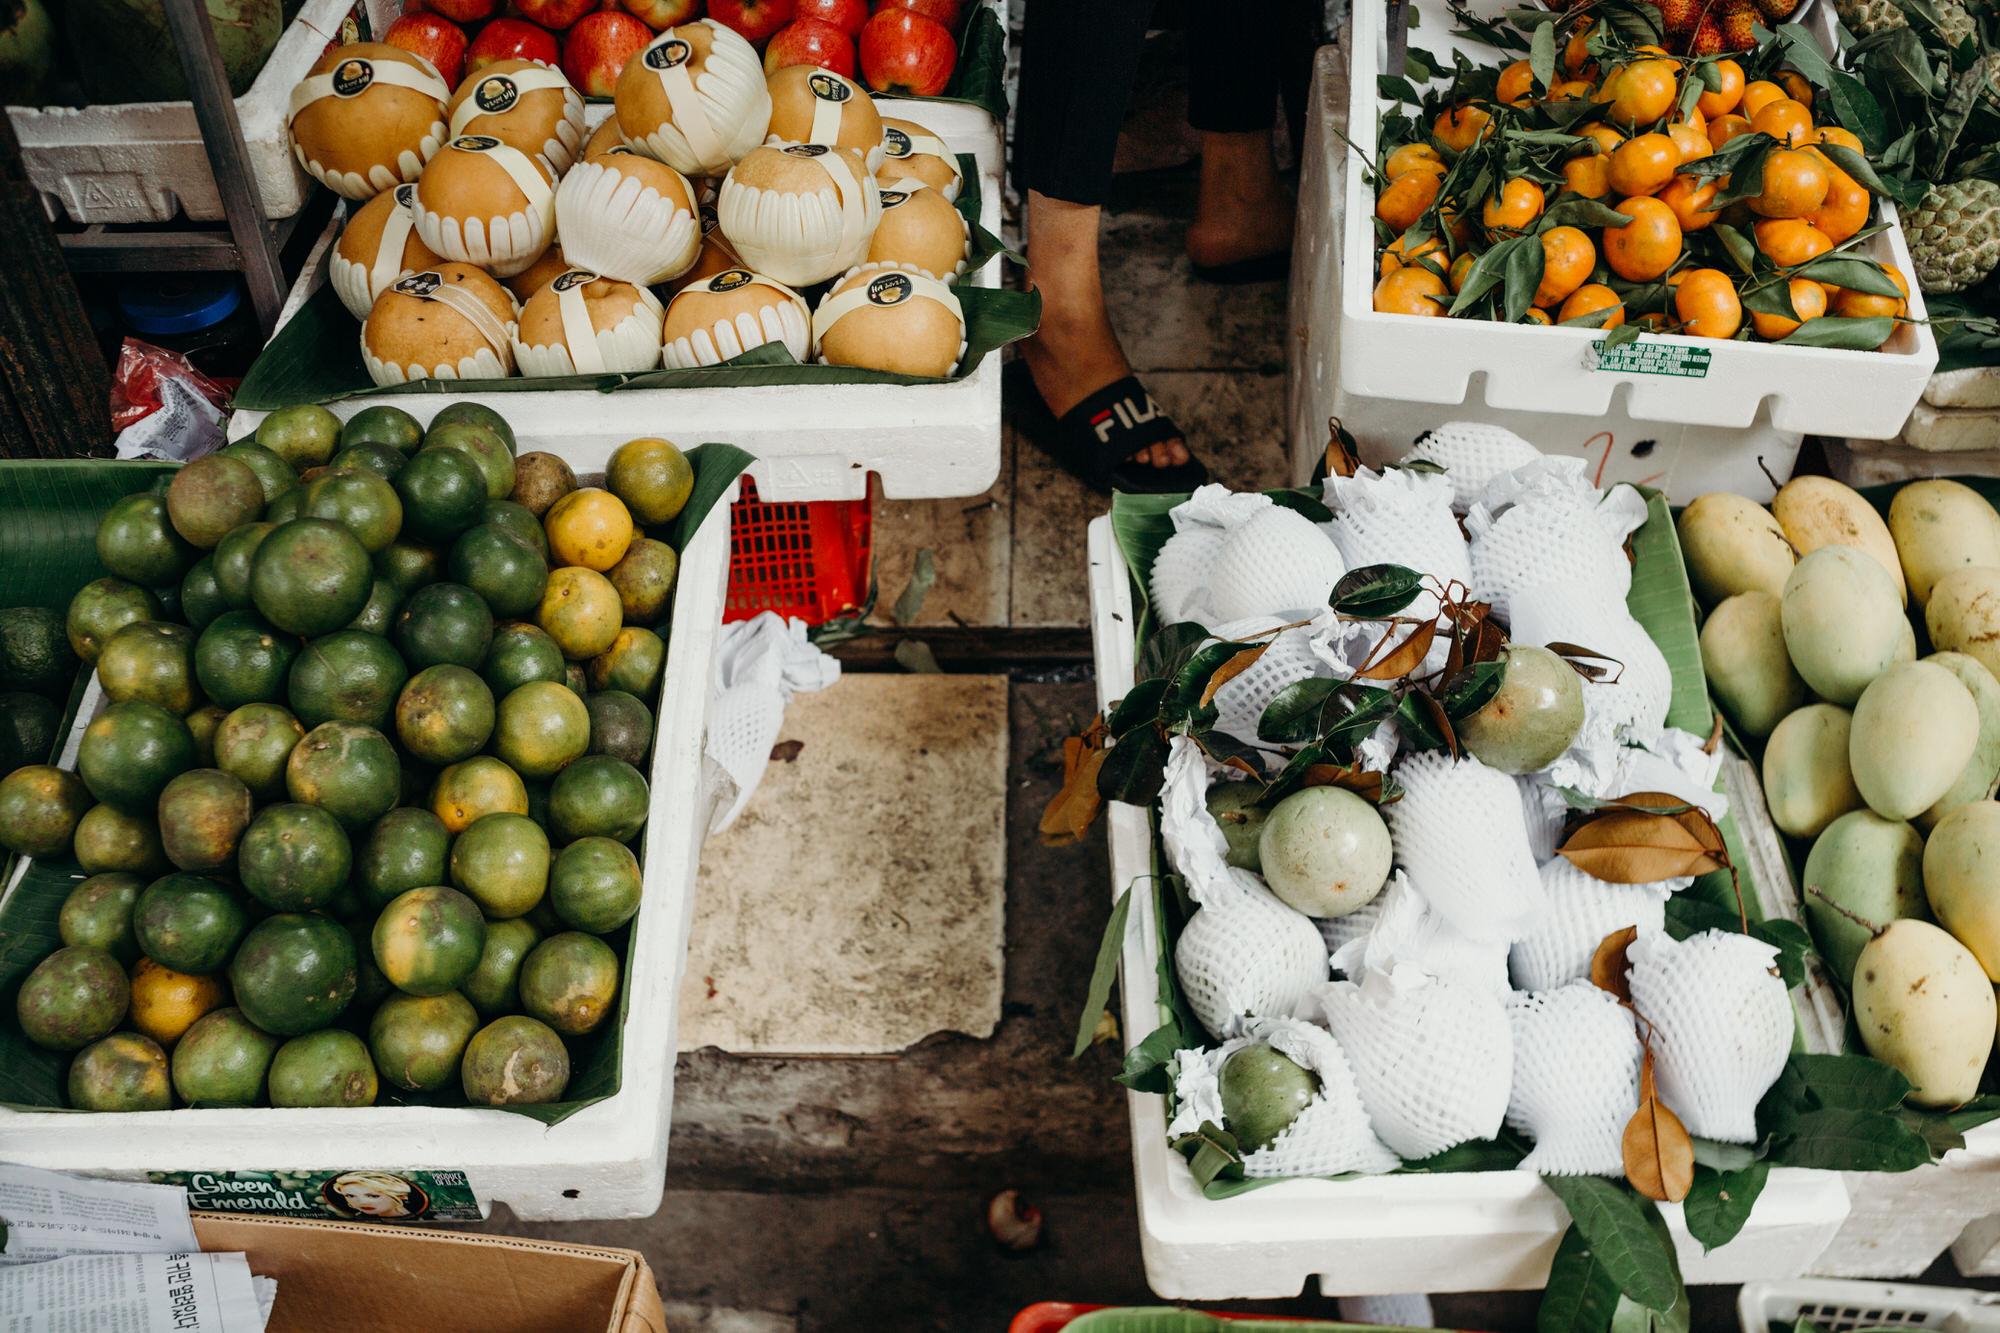 hanoivietnamcitytravelblog-9845-1.jpg